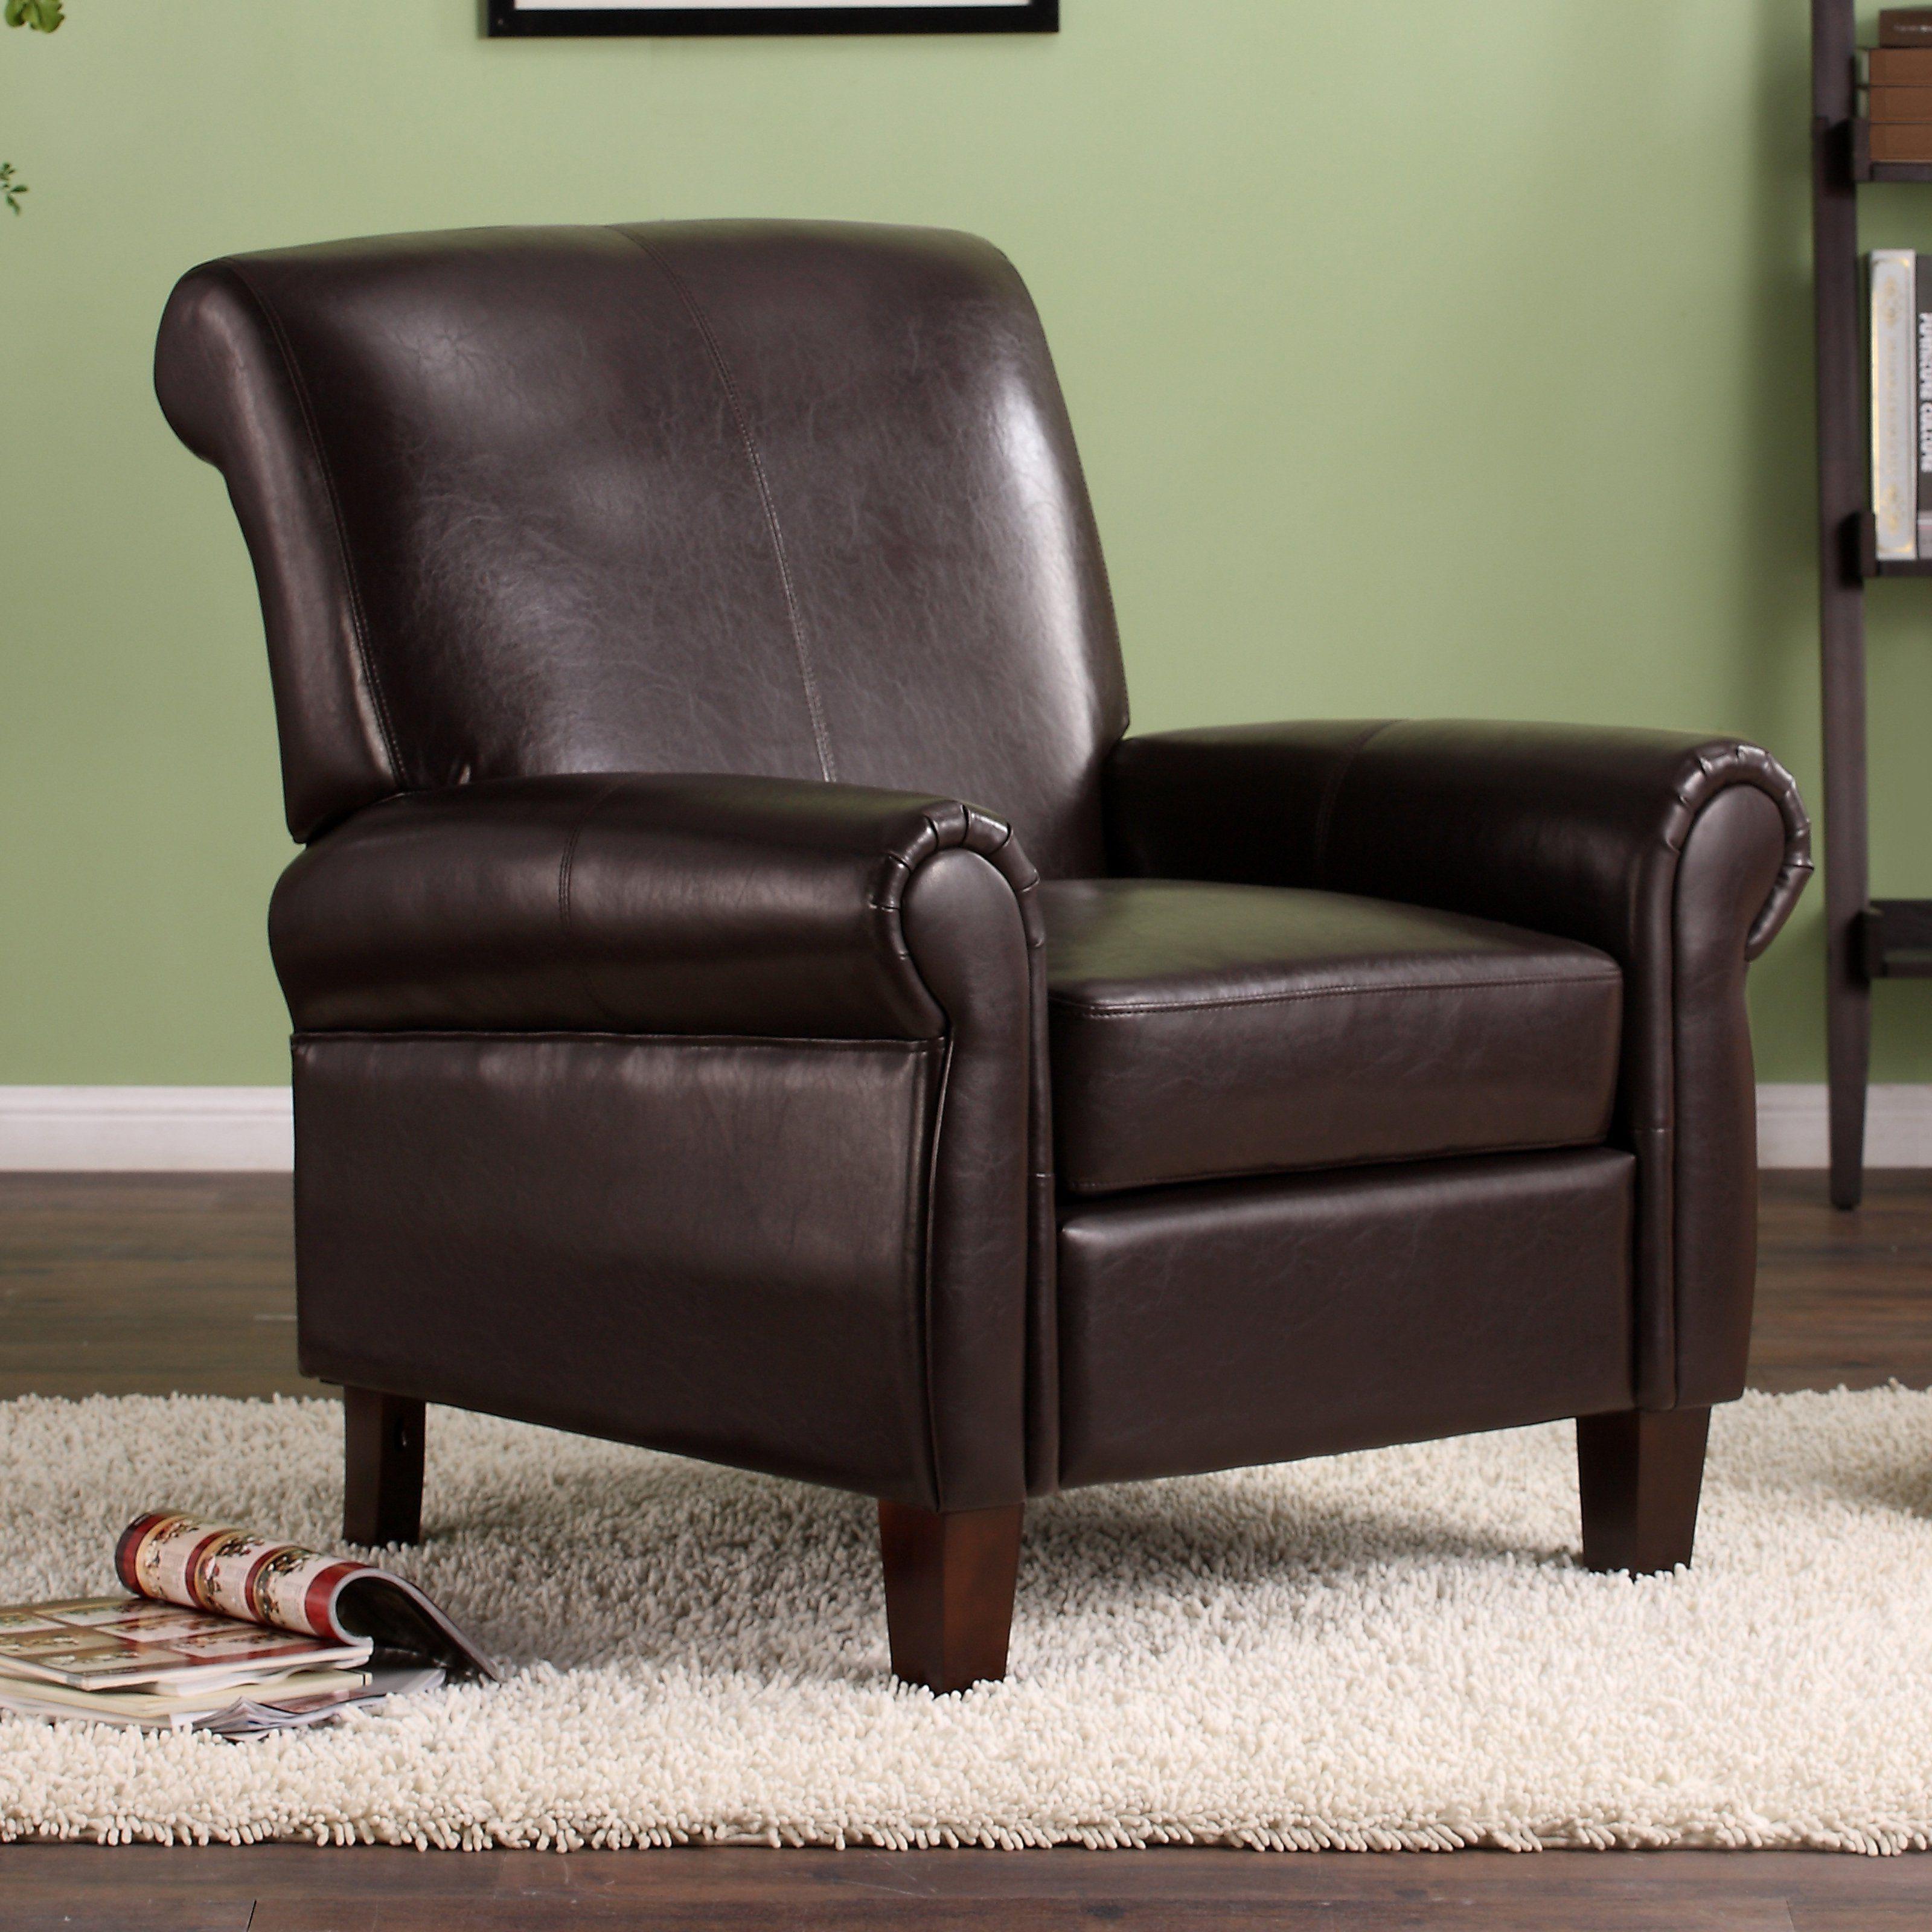 Dorel Living Faux Leather Club Chair Dorel Living Leather Club Chairs Leather Accent Chair